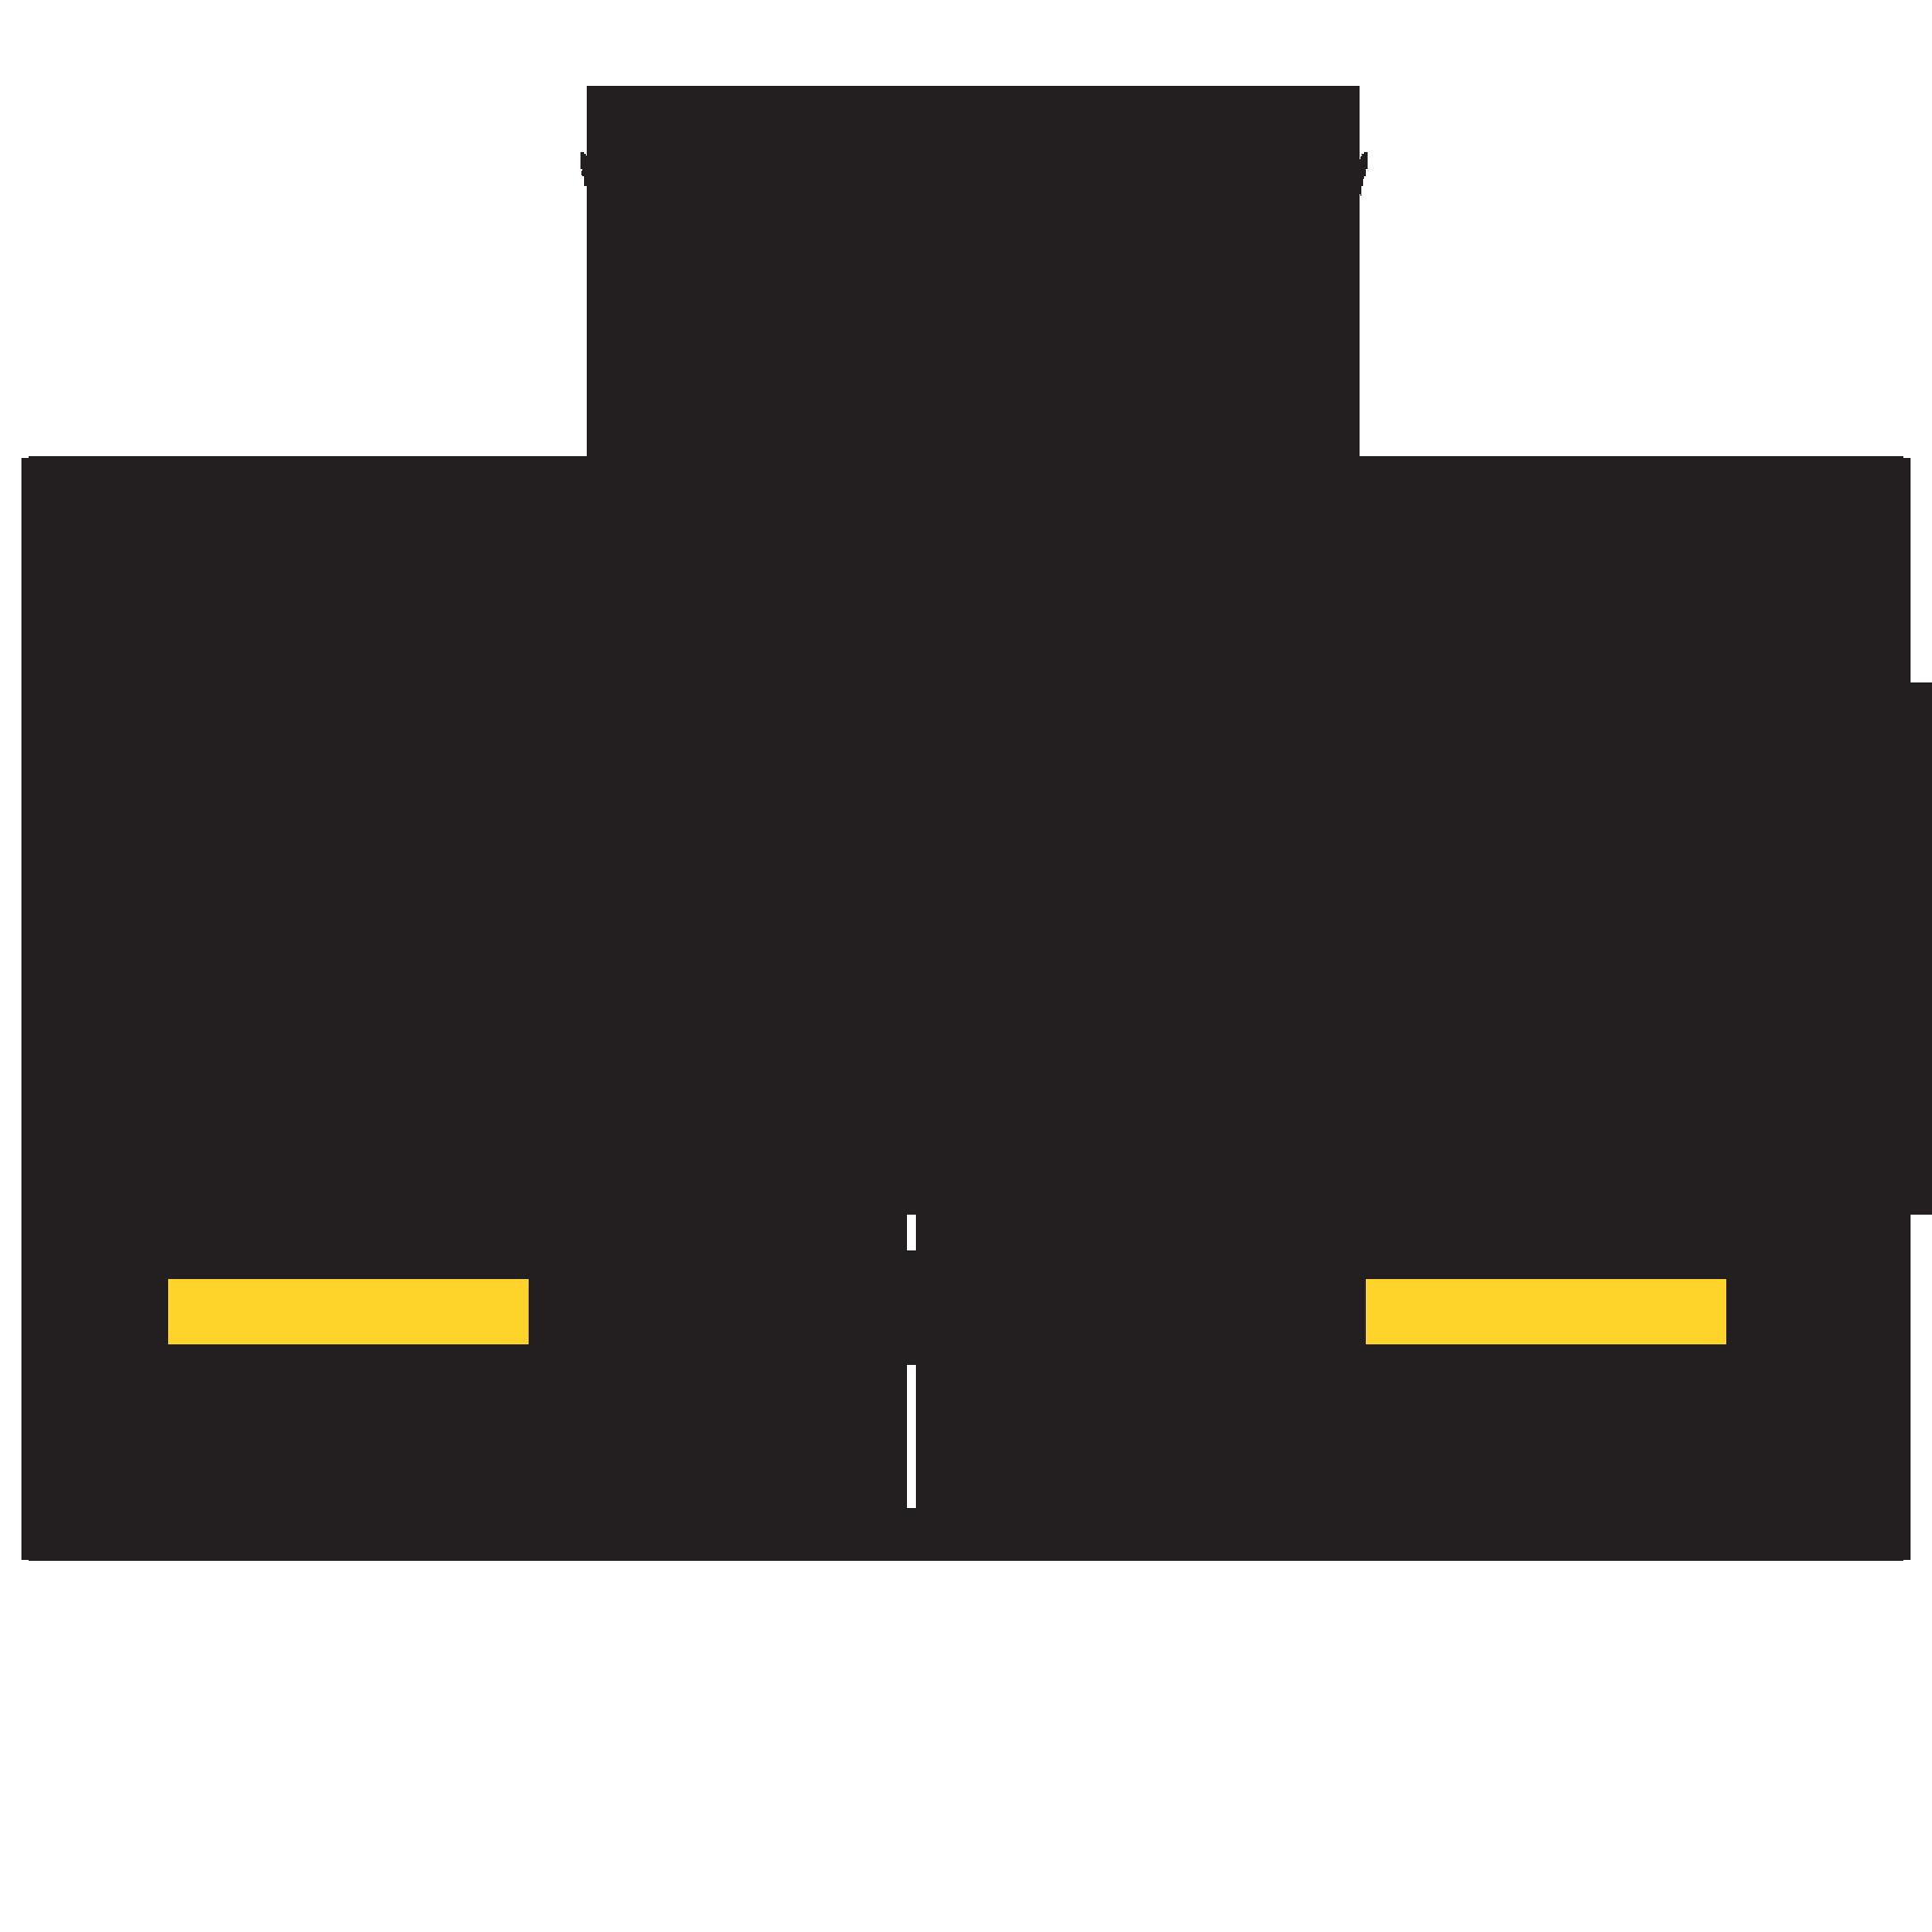 2018 FIFA 19 - Tournament Winner